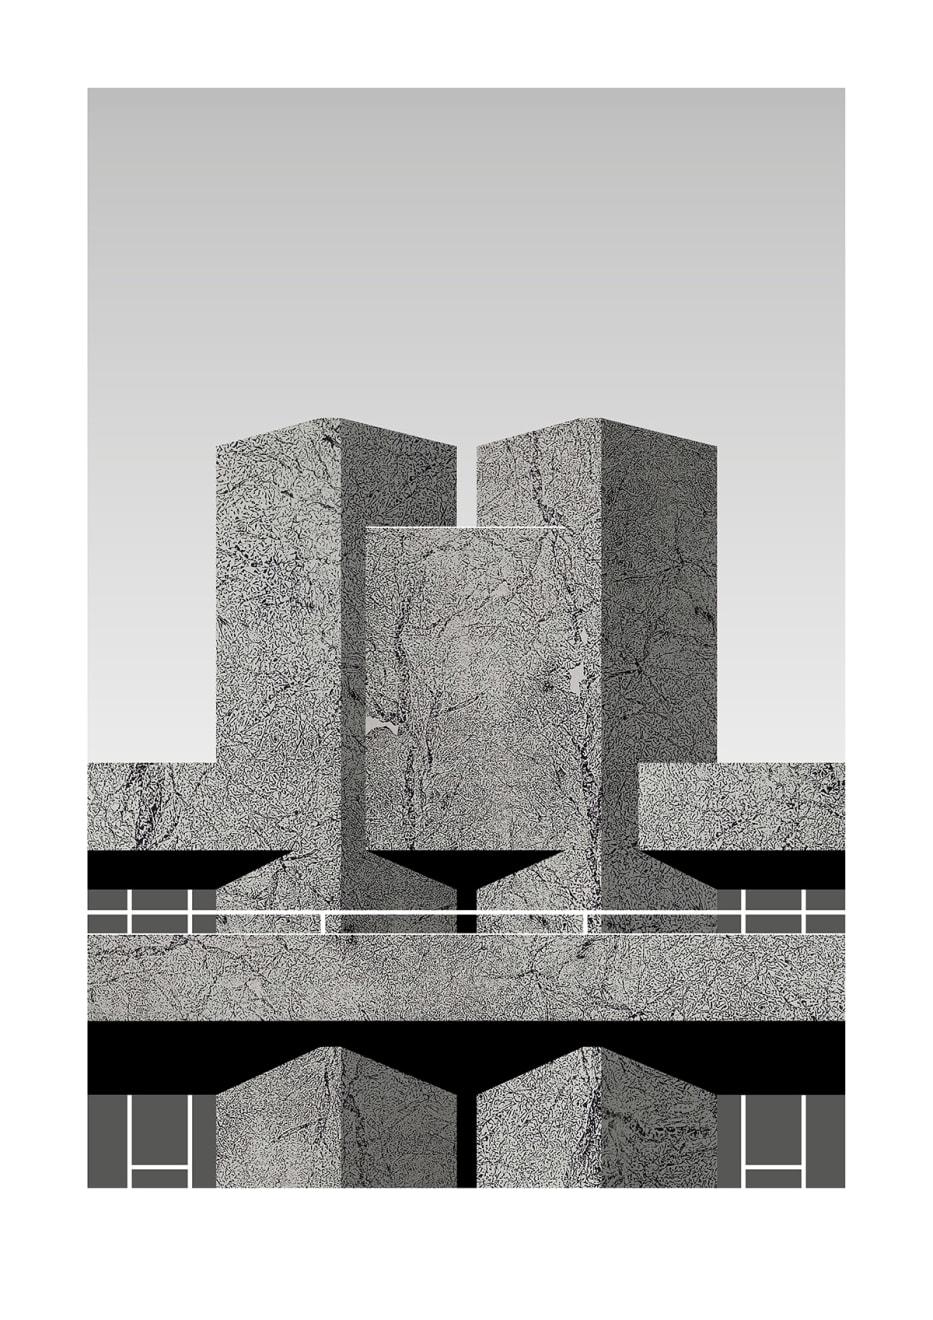 Hamish Macaulay, National Theatre '76 (Grey), 2018